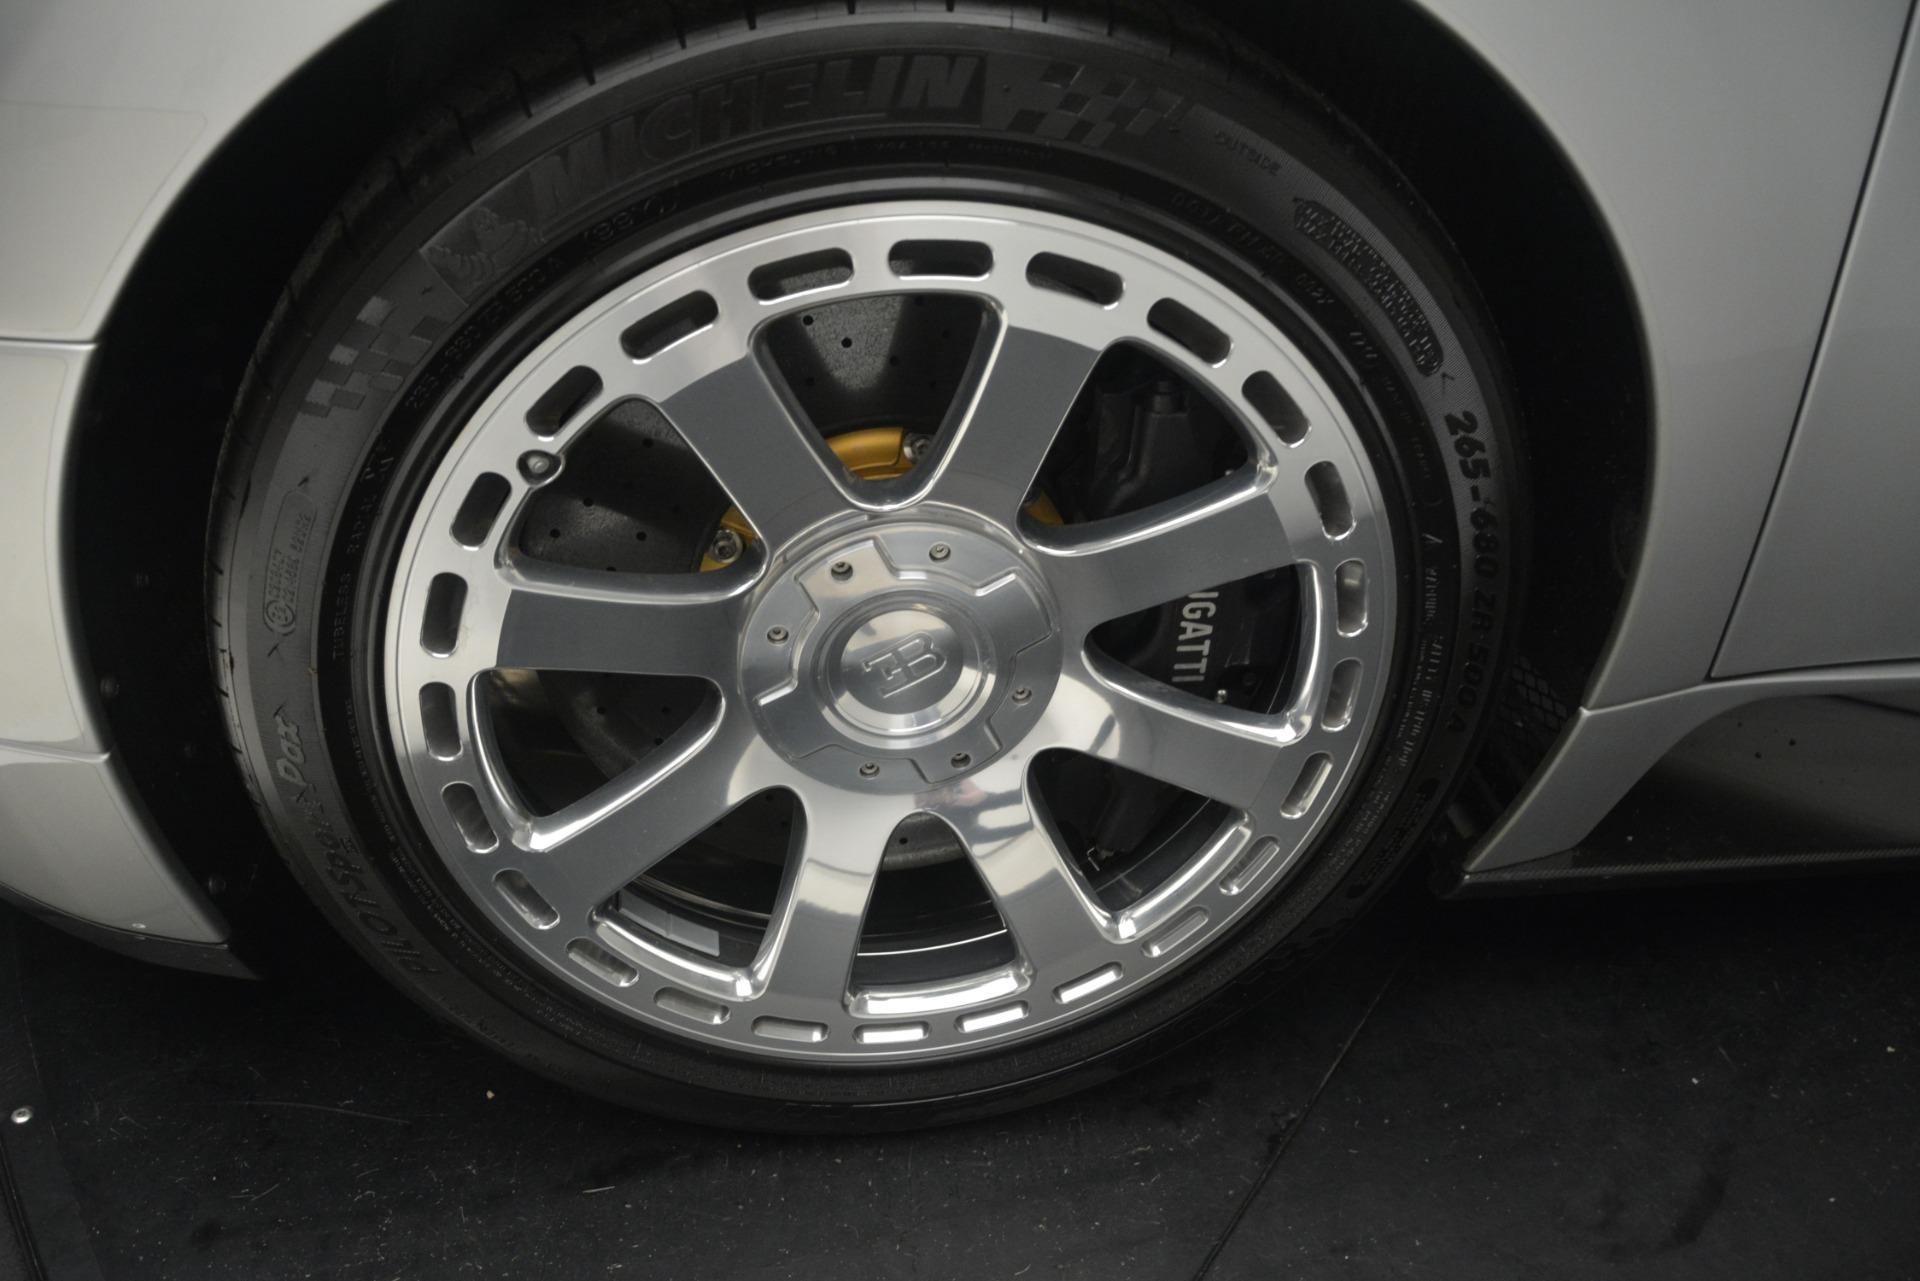 Used 2010 Bugatti Veyron 16.4 Grand Sport For Sale In Greenwich, CT 3159_p39